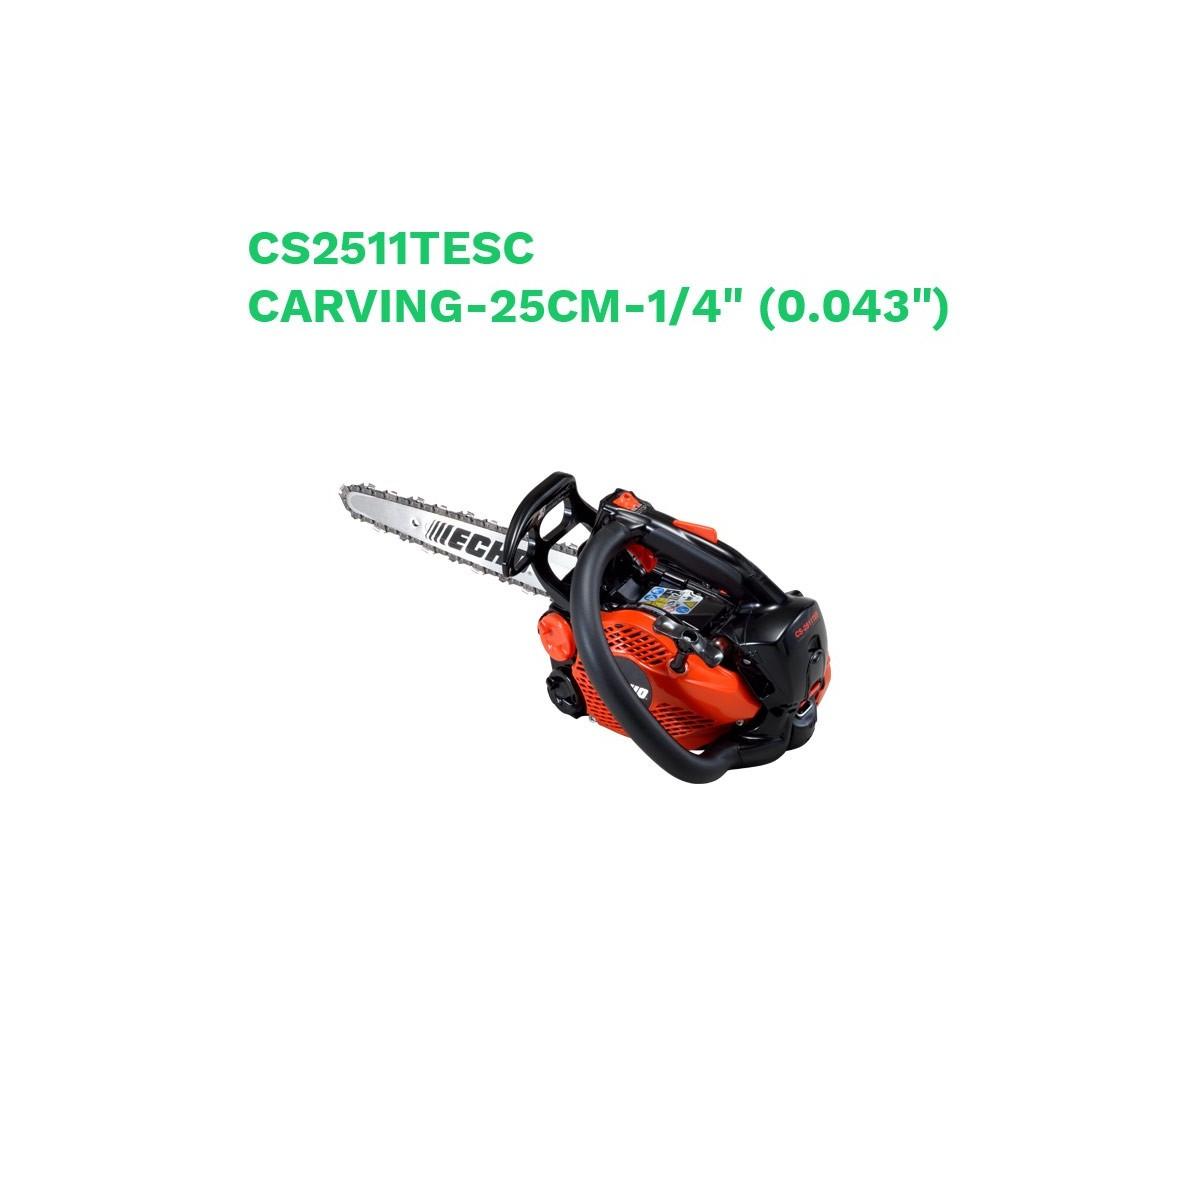 "Echo motosierra cs2511tesc carving-25cm-1/4"" (0.043"")"